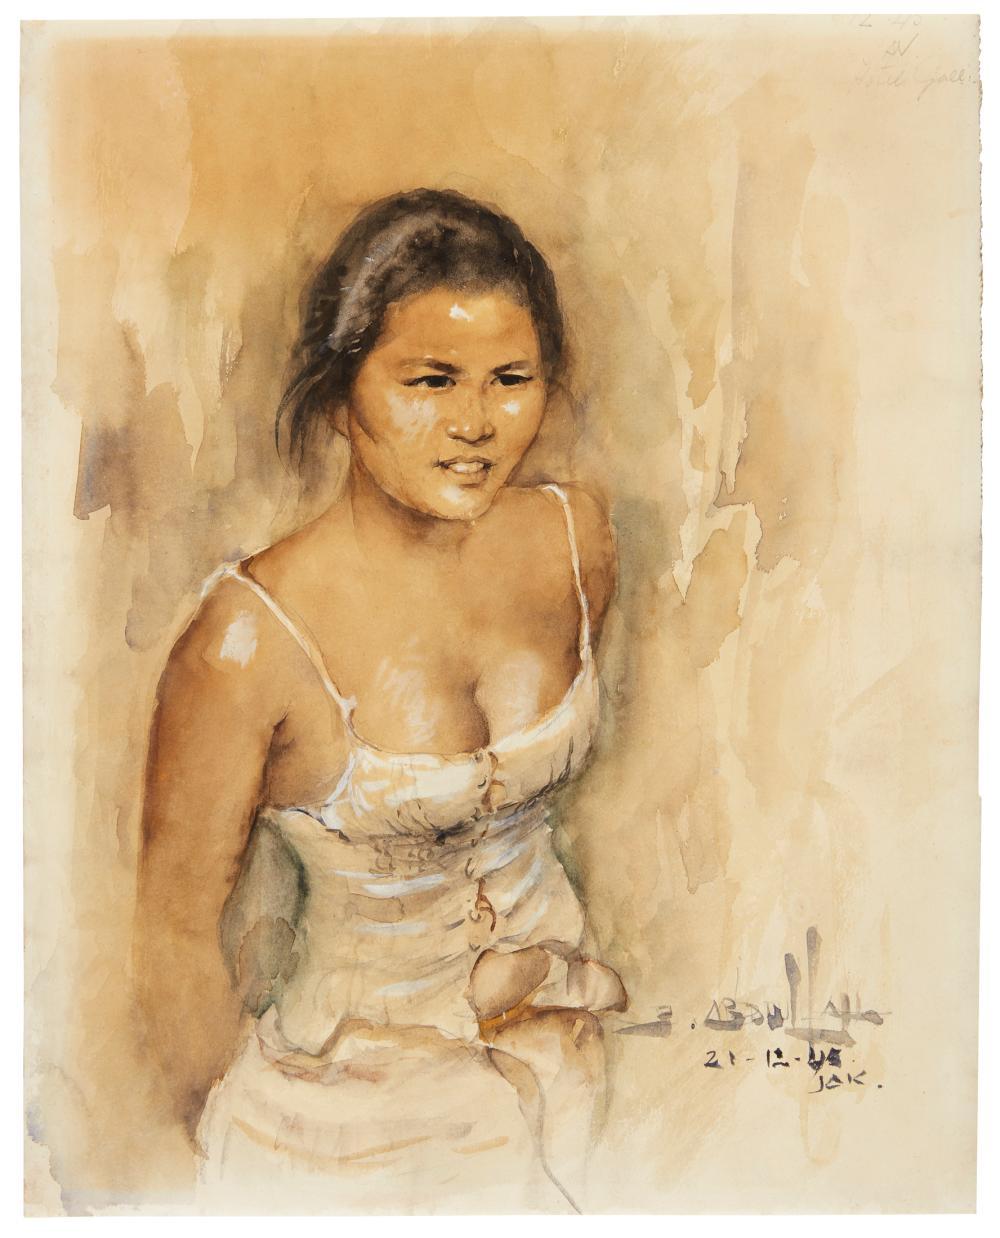 Indisch meisje met gedeeltelijk losgeknoopt onderhemd (Javanese girl with partially unbuttoned undershirt), 1945.